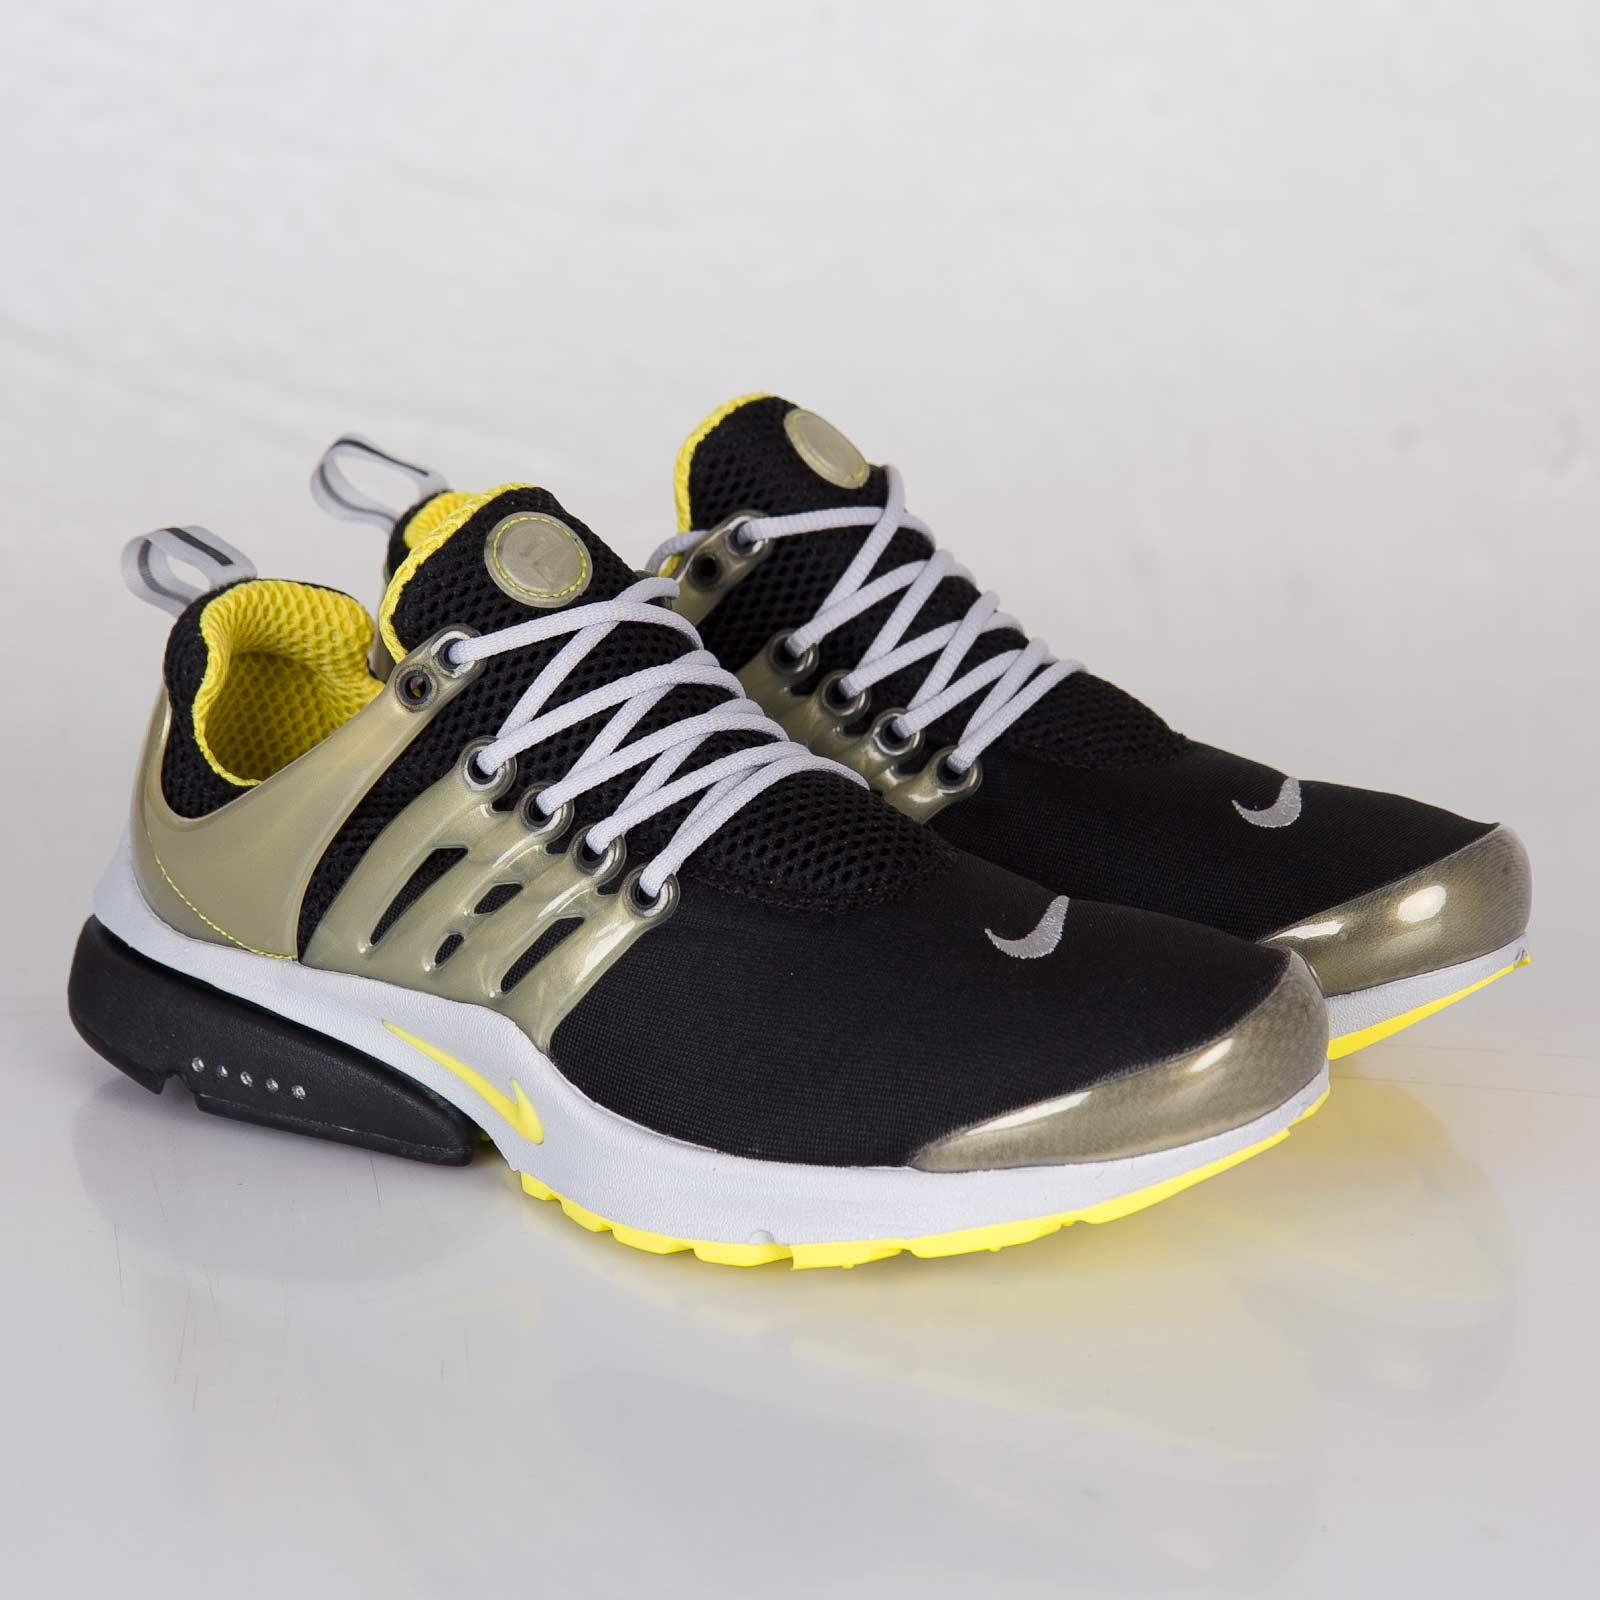 Nike Air Presto SP - 689800-007 - Sneakersnstuff  09a664e92608